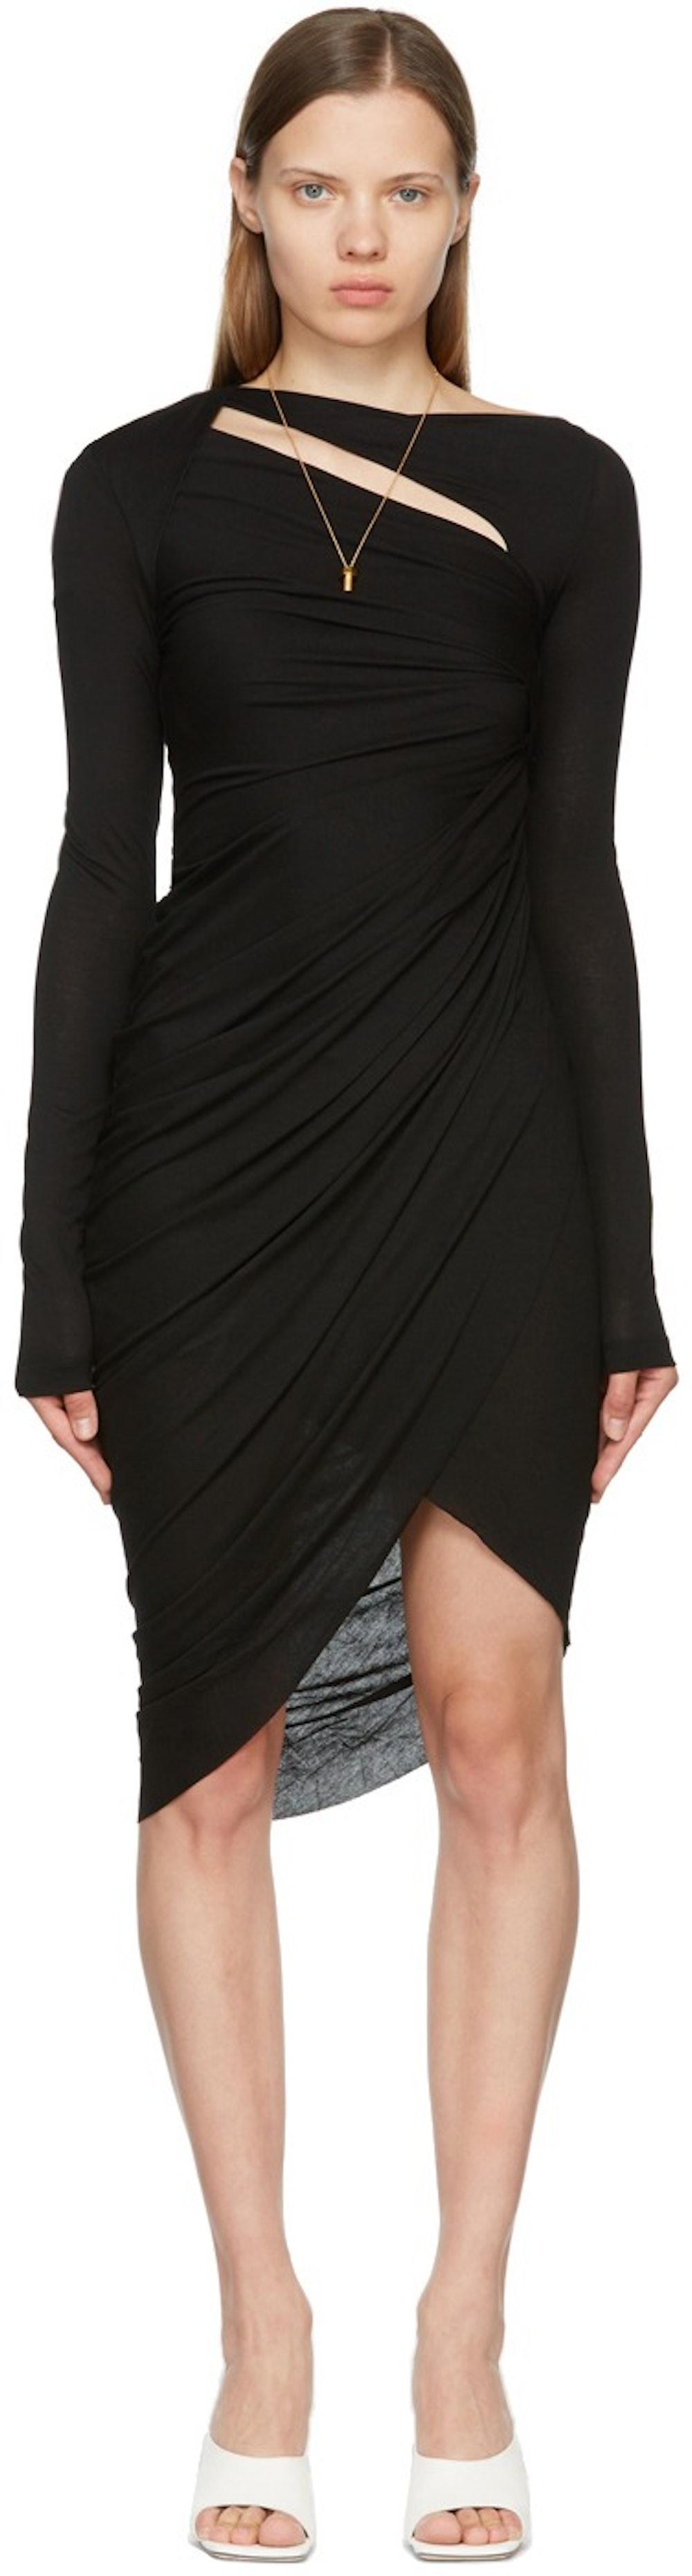 Helmut Lang Black Ruched Long Sleeve Dress